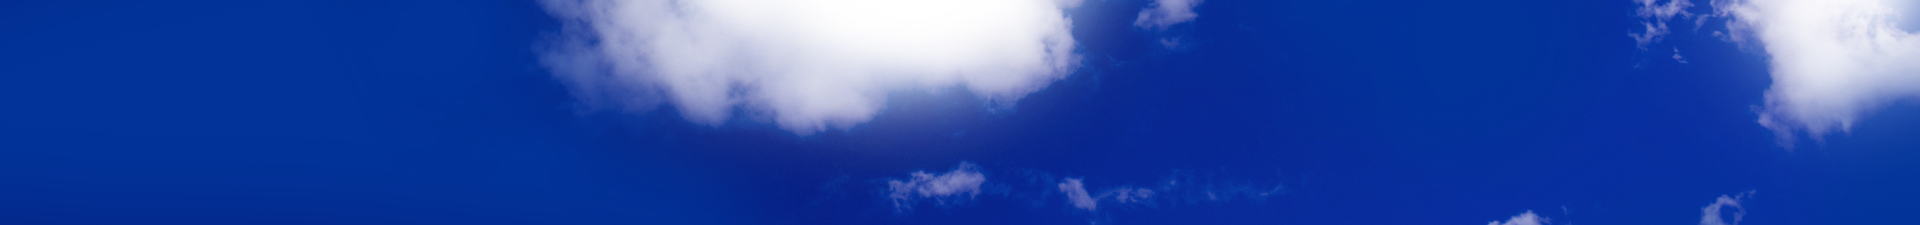 cloud-bg